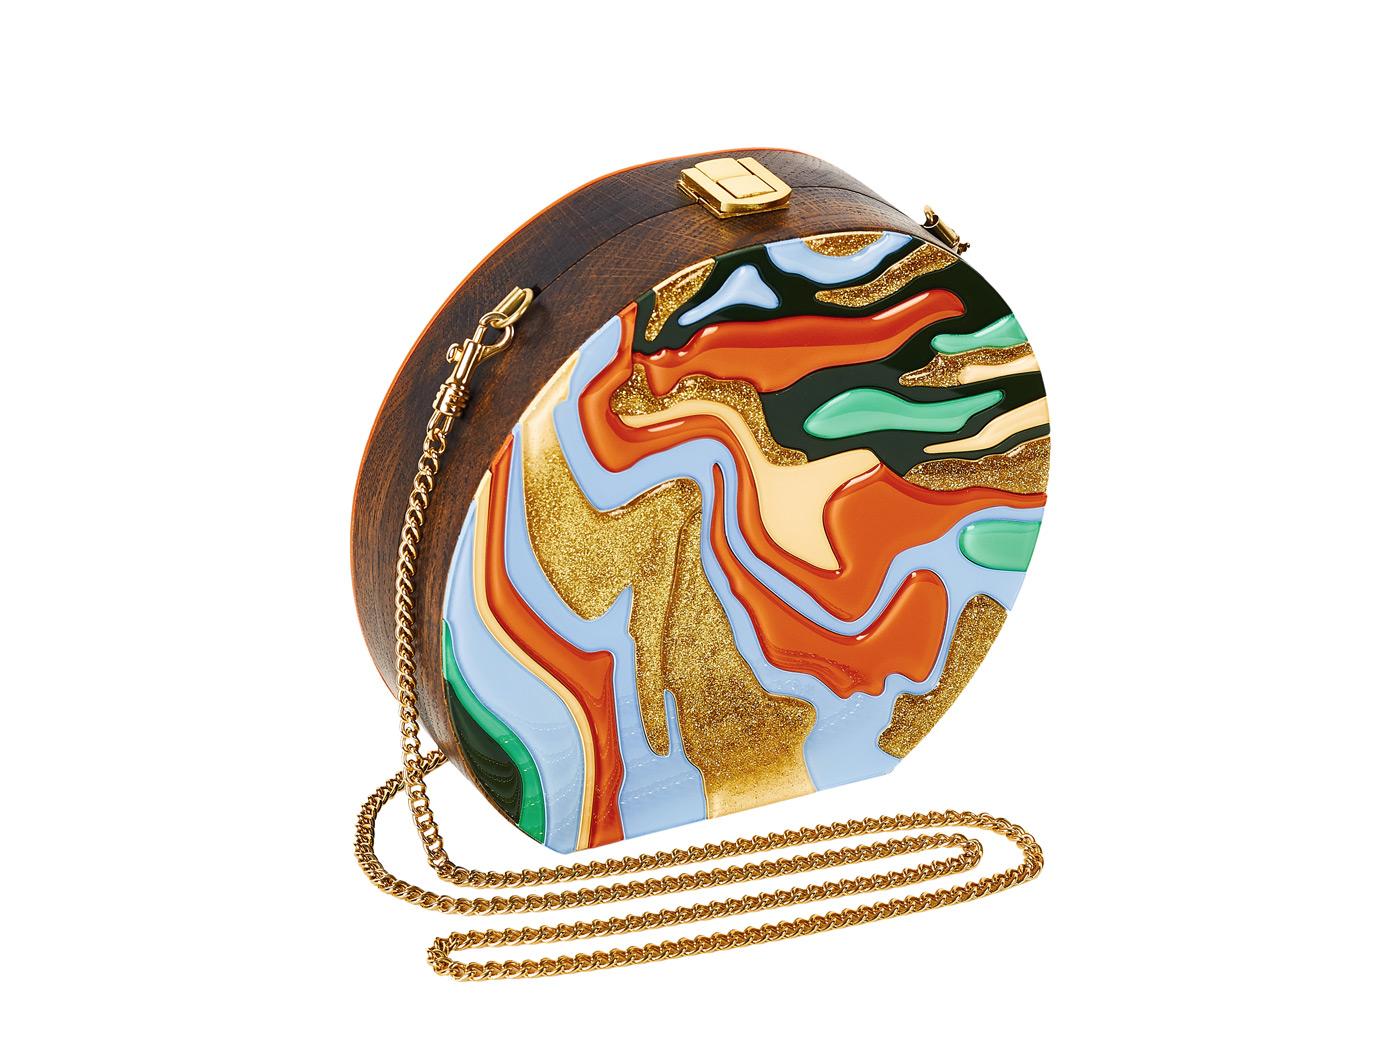 Golovina-marble-clutch-bag-orange-and-blue-3